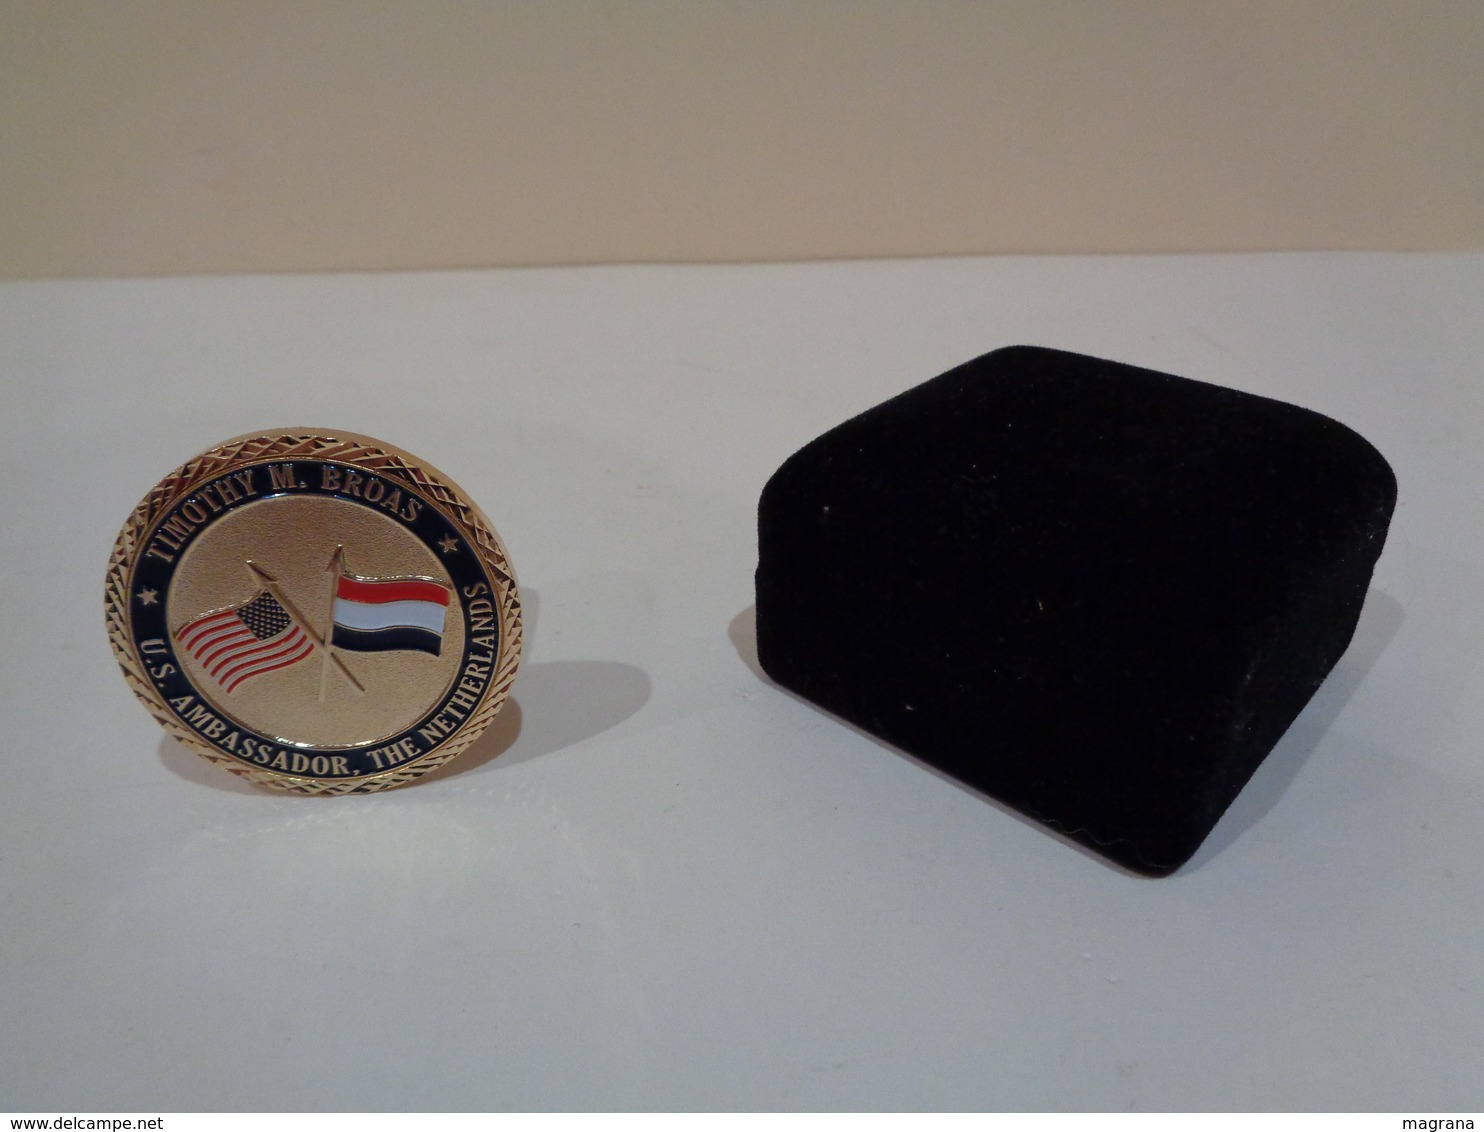 Medalla Con Estuche. Department Of State, United States Of America. Timothy M. Broas, U. S. Ambassador. The Nederlands. - Monarquía/ Nobleza